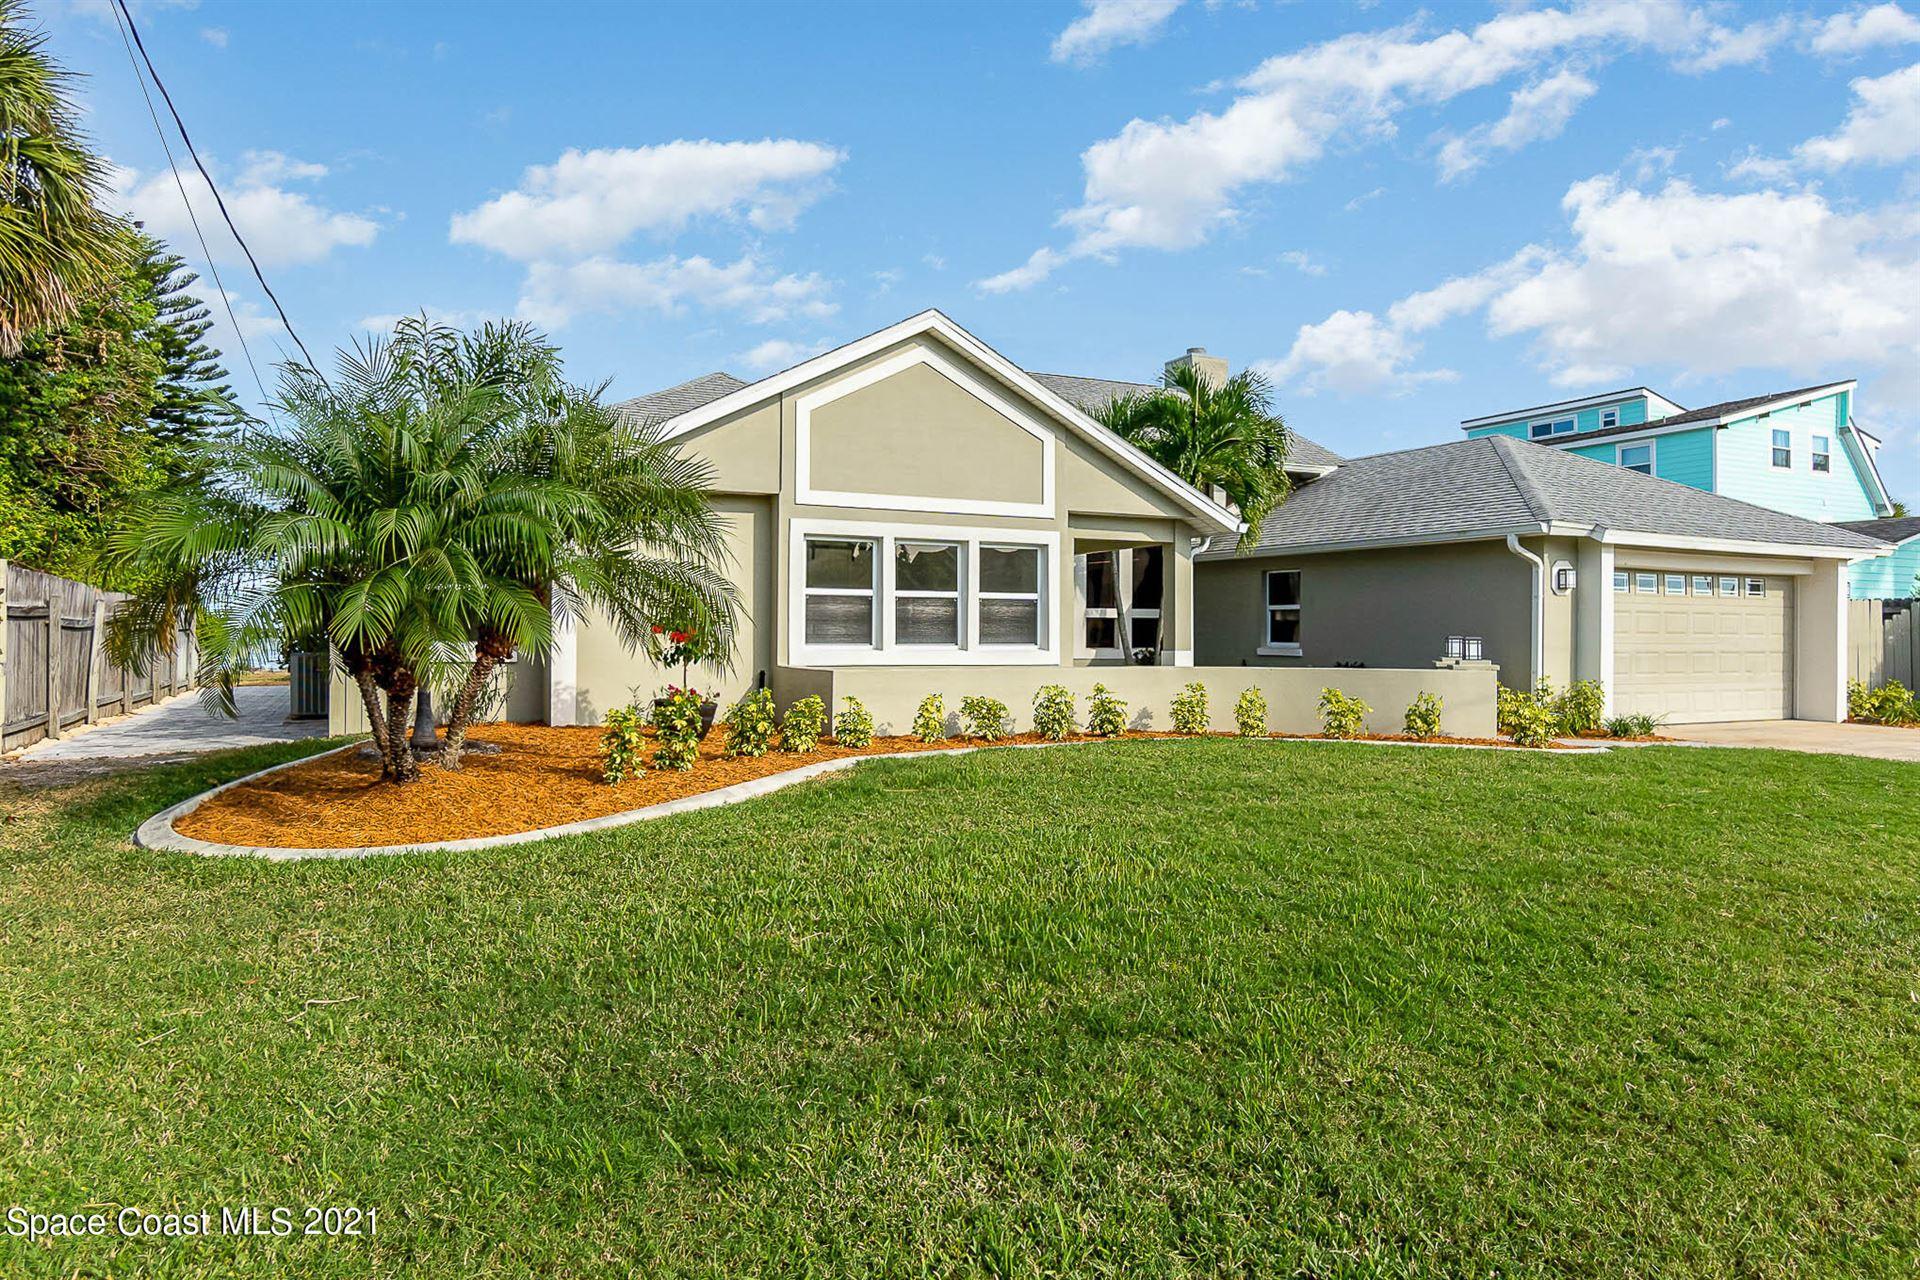 450 Milford Point Drive                                                                               Merritt Island                                                                      , FL - $1,240,000